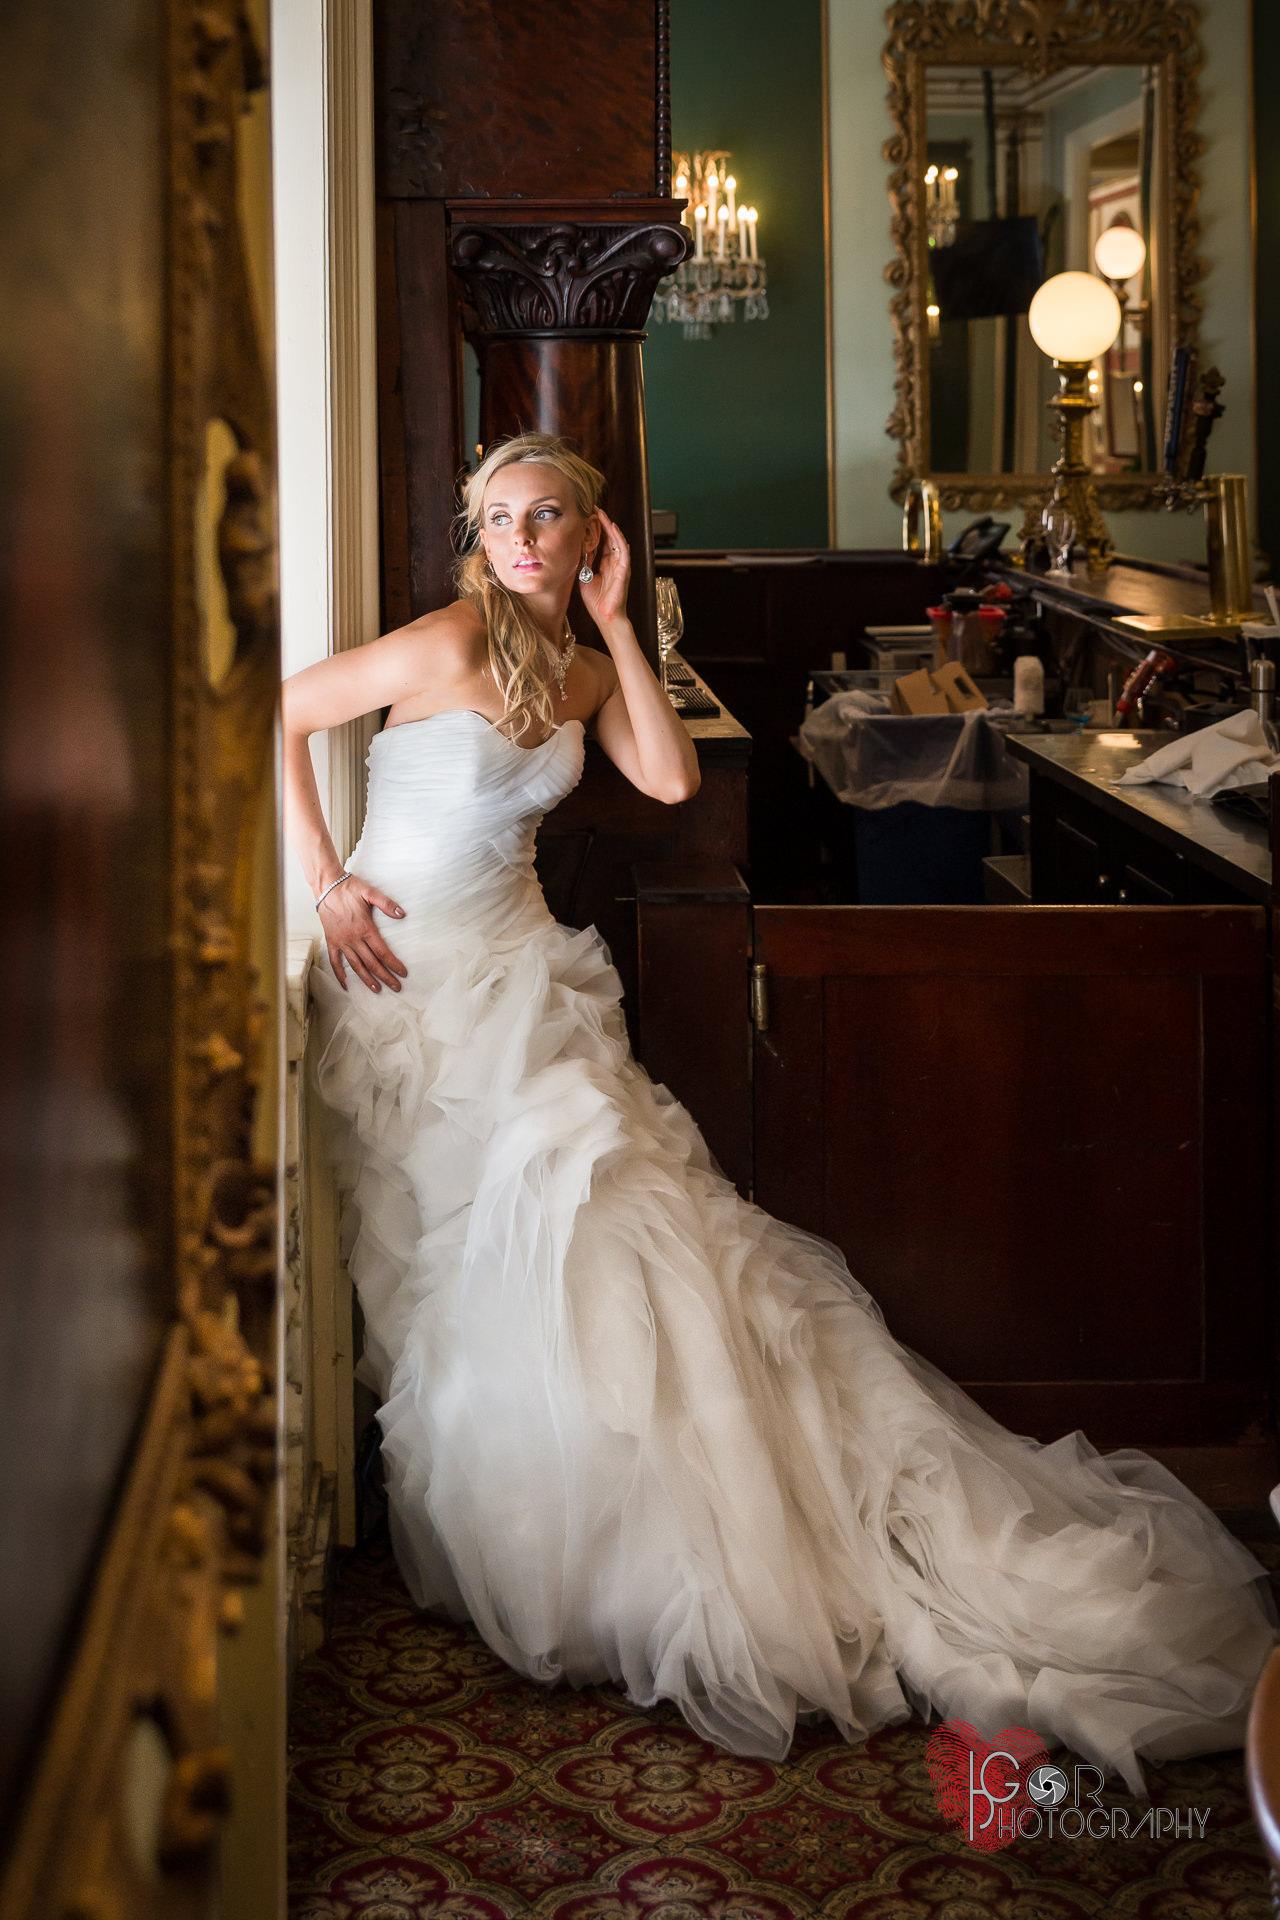 Romantic bride photography